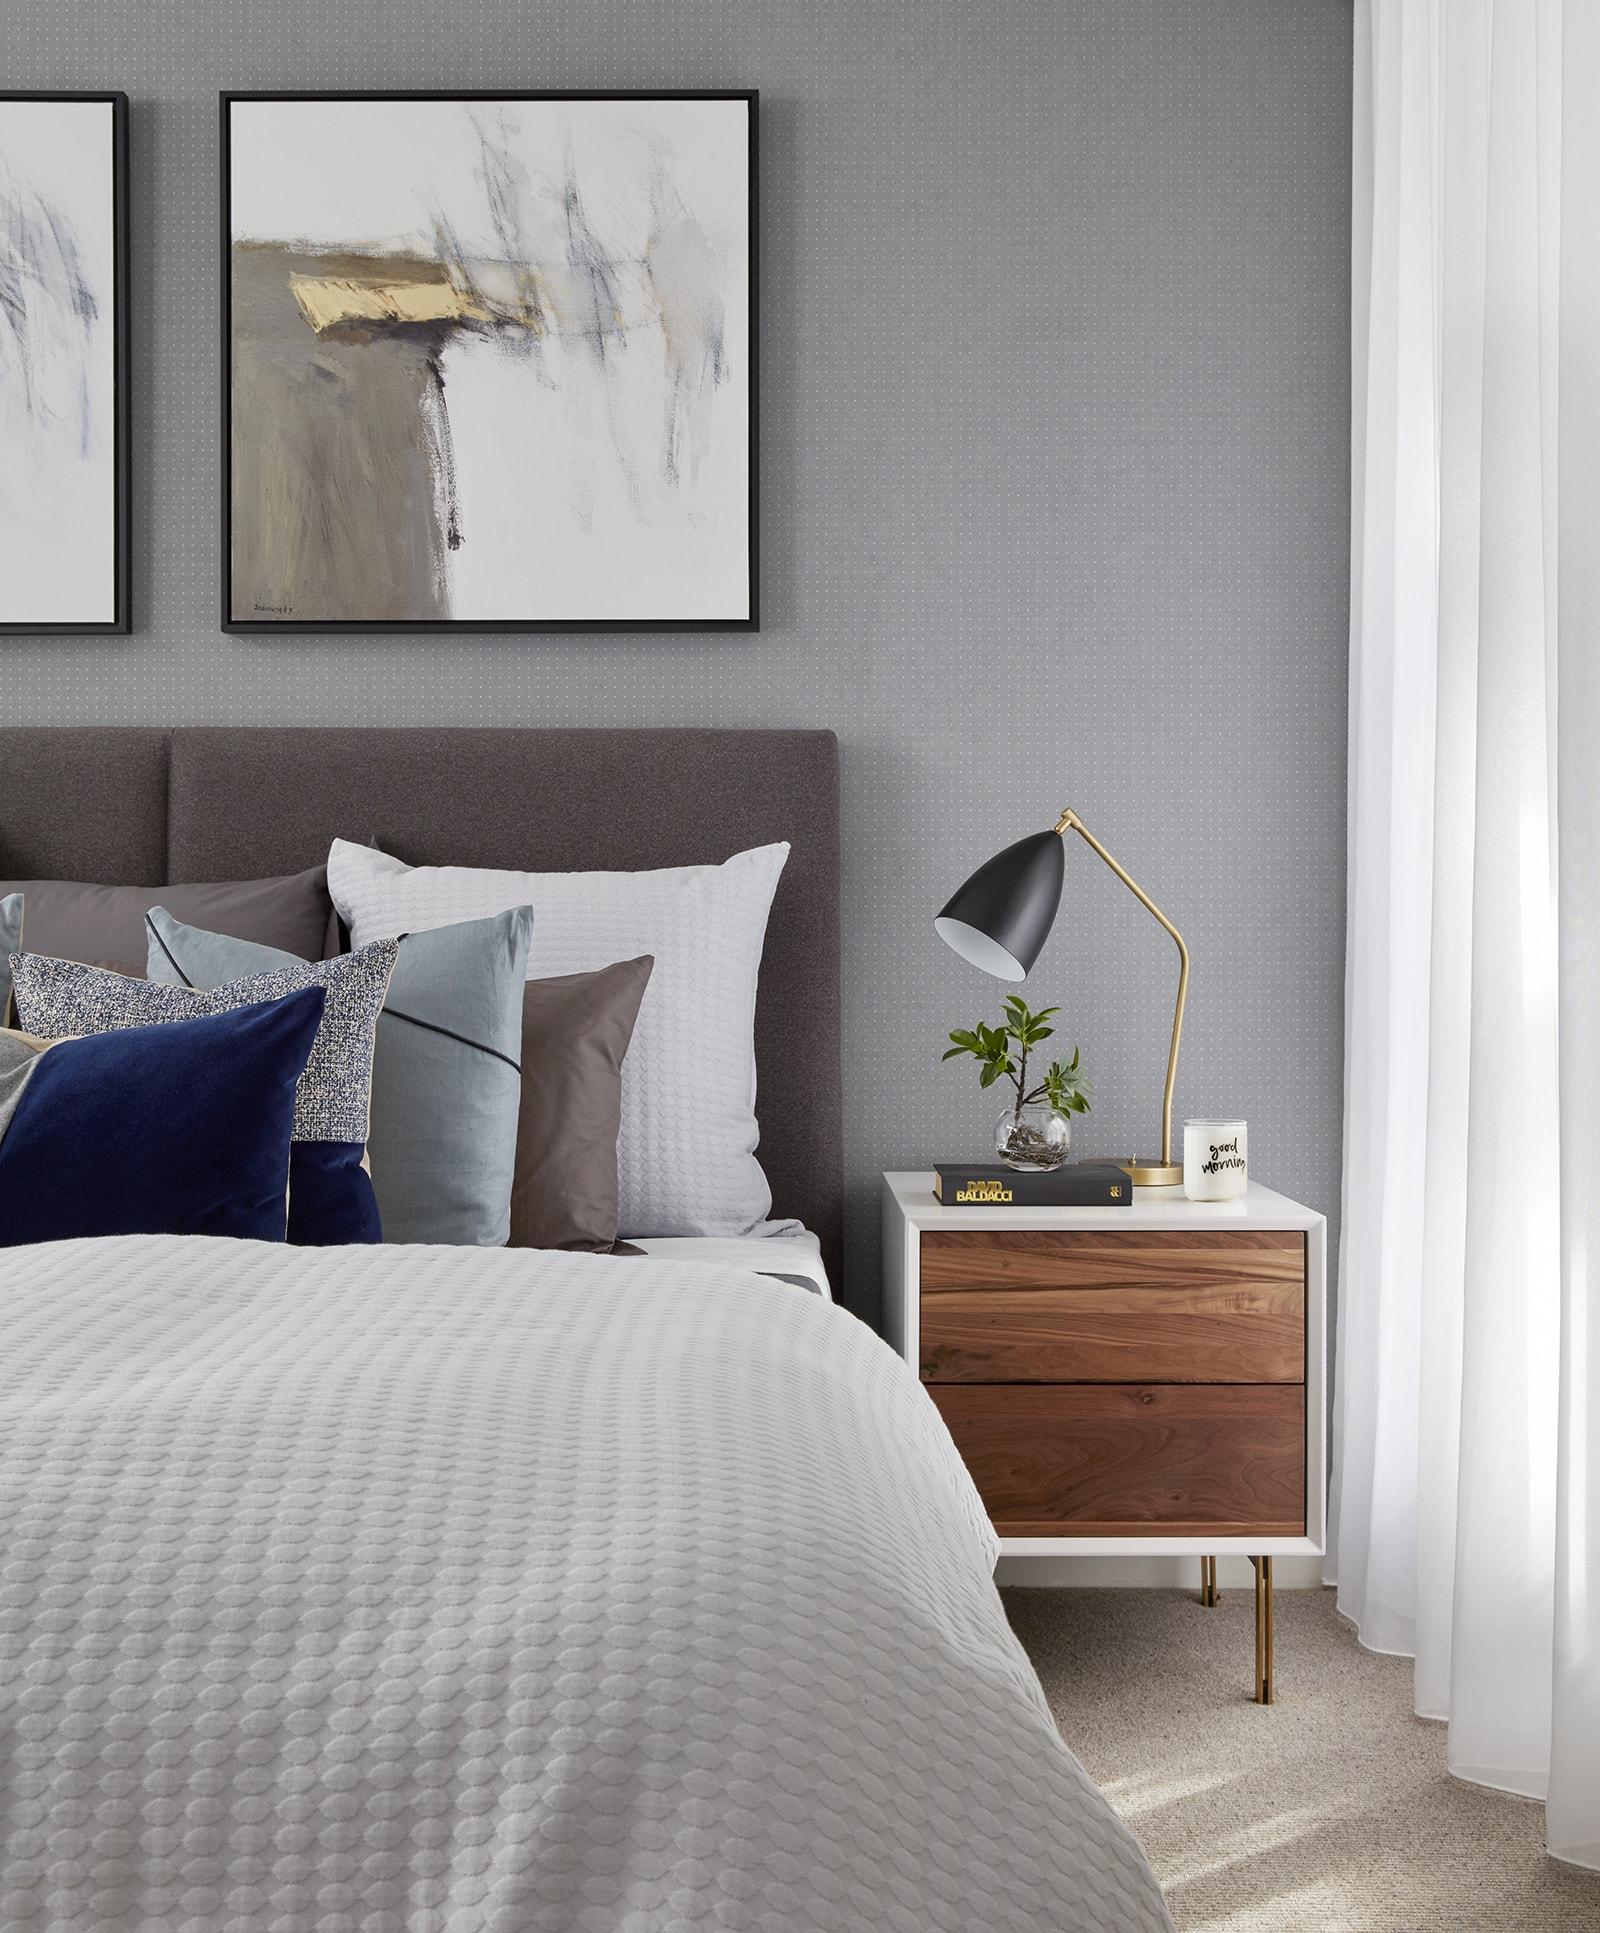 Bedroom Feature Wall Ideas 10 Stylish Options Tlc Interiors